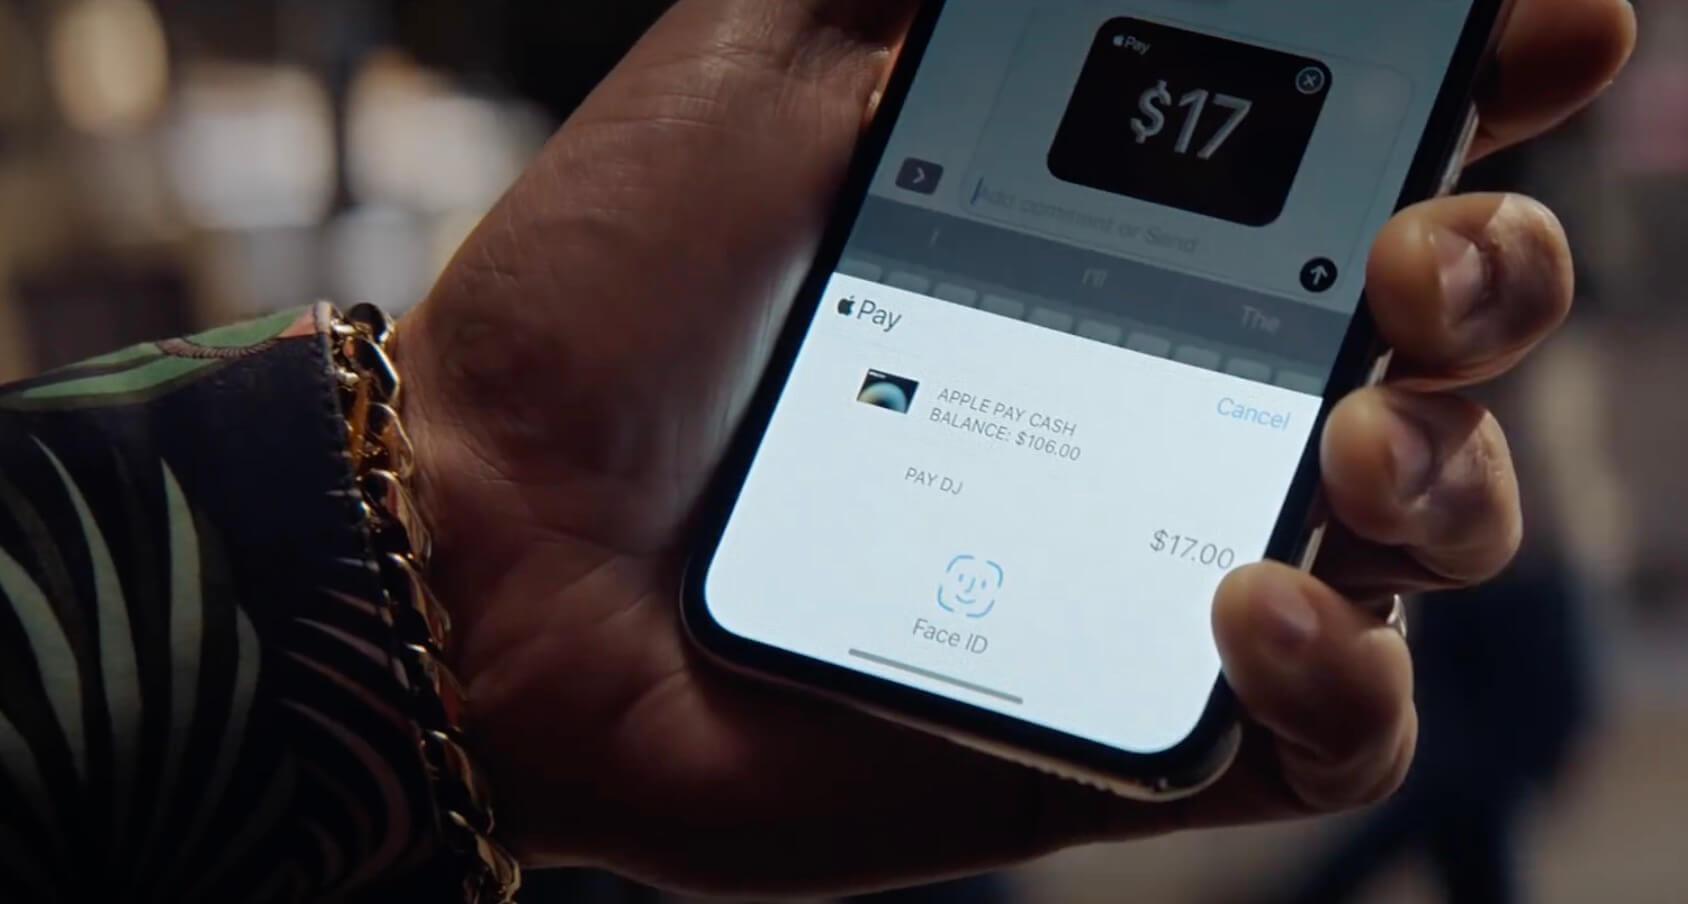 Apple Pay Cash iMessage